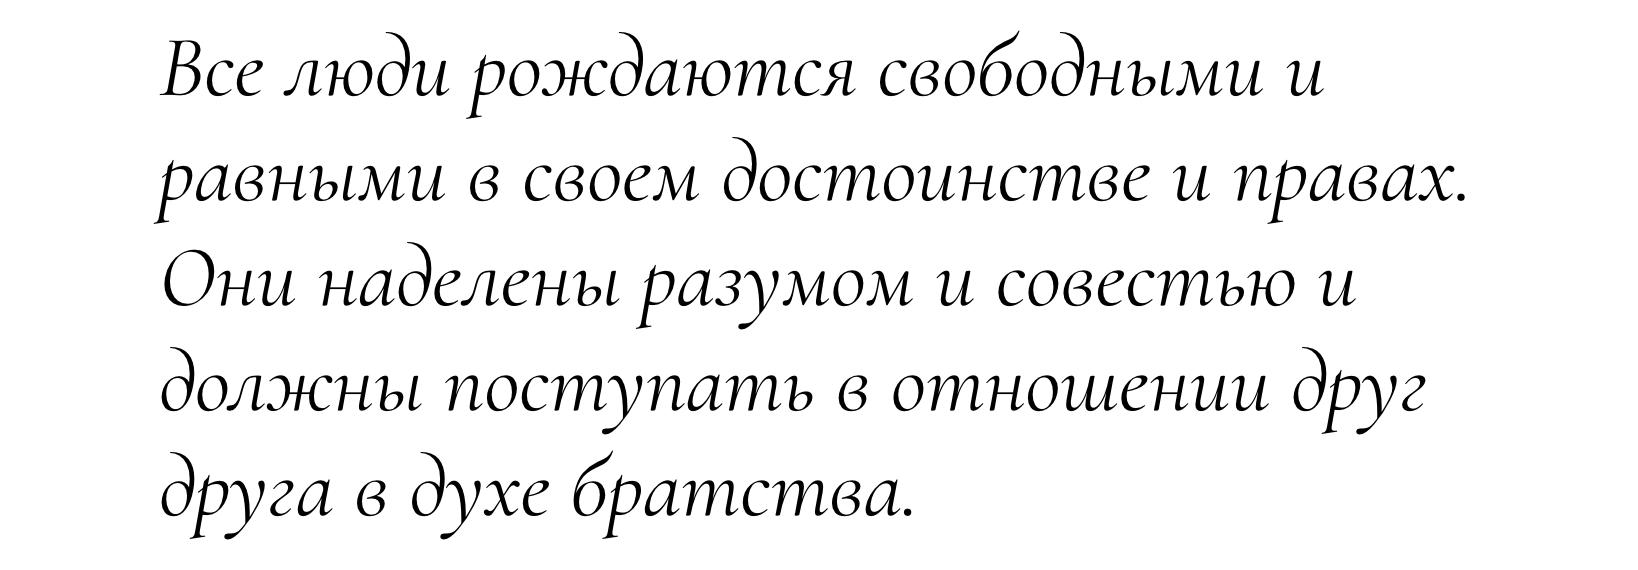 cormorant font banner6